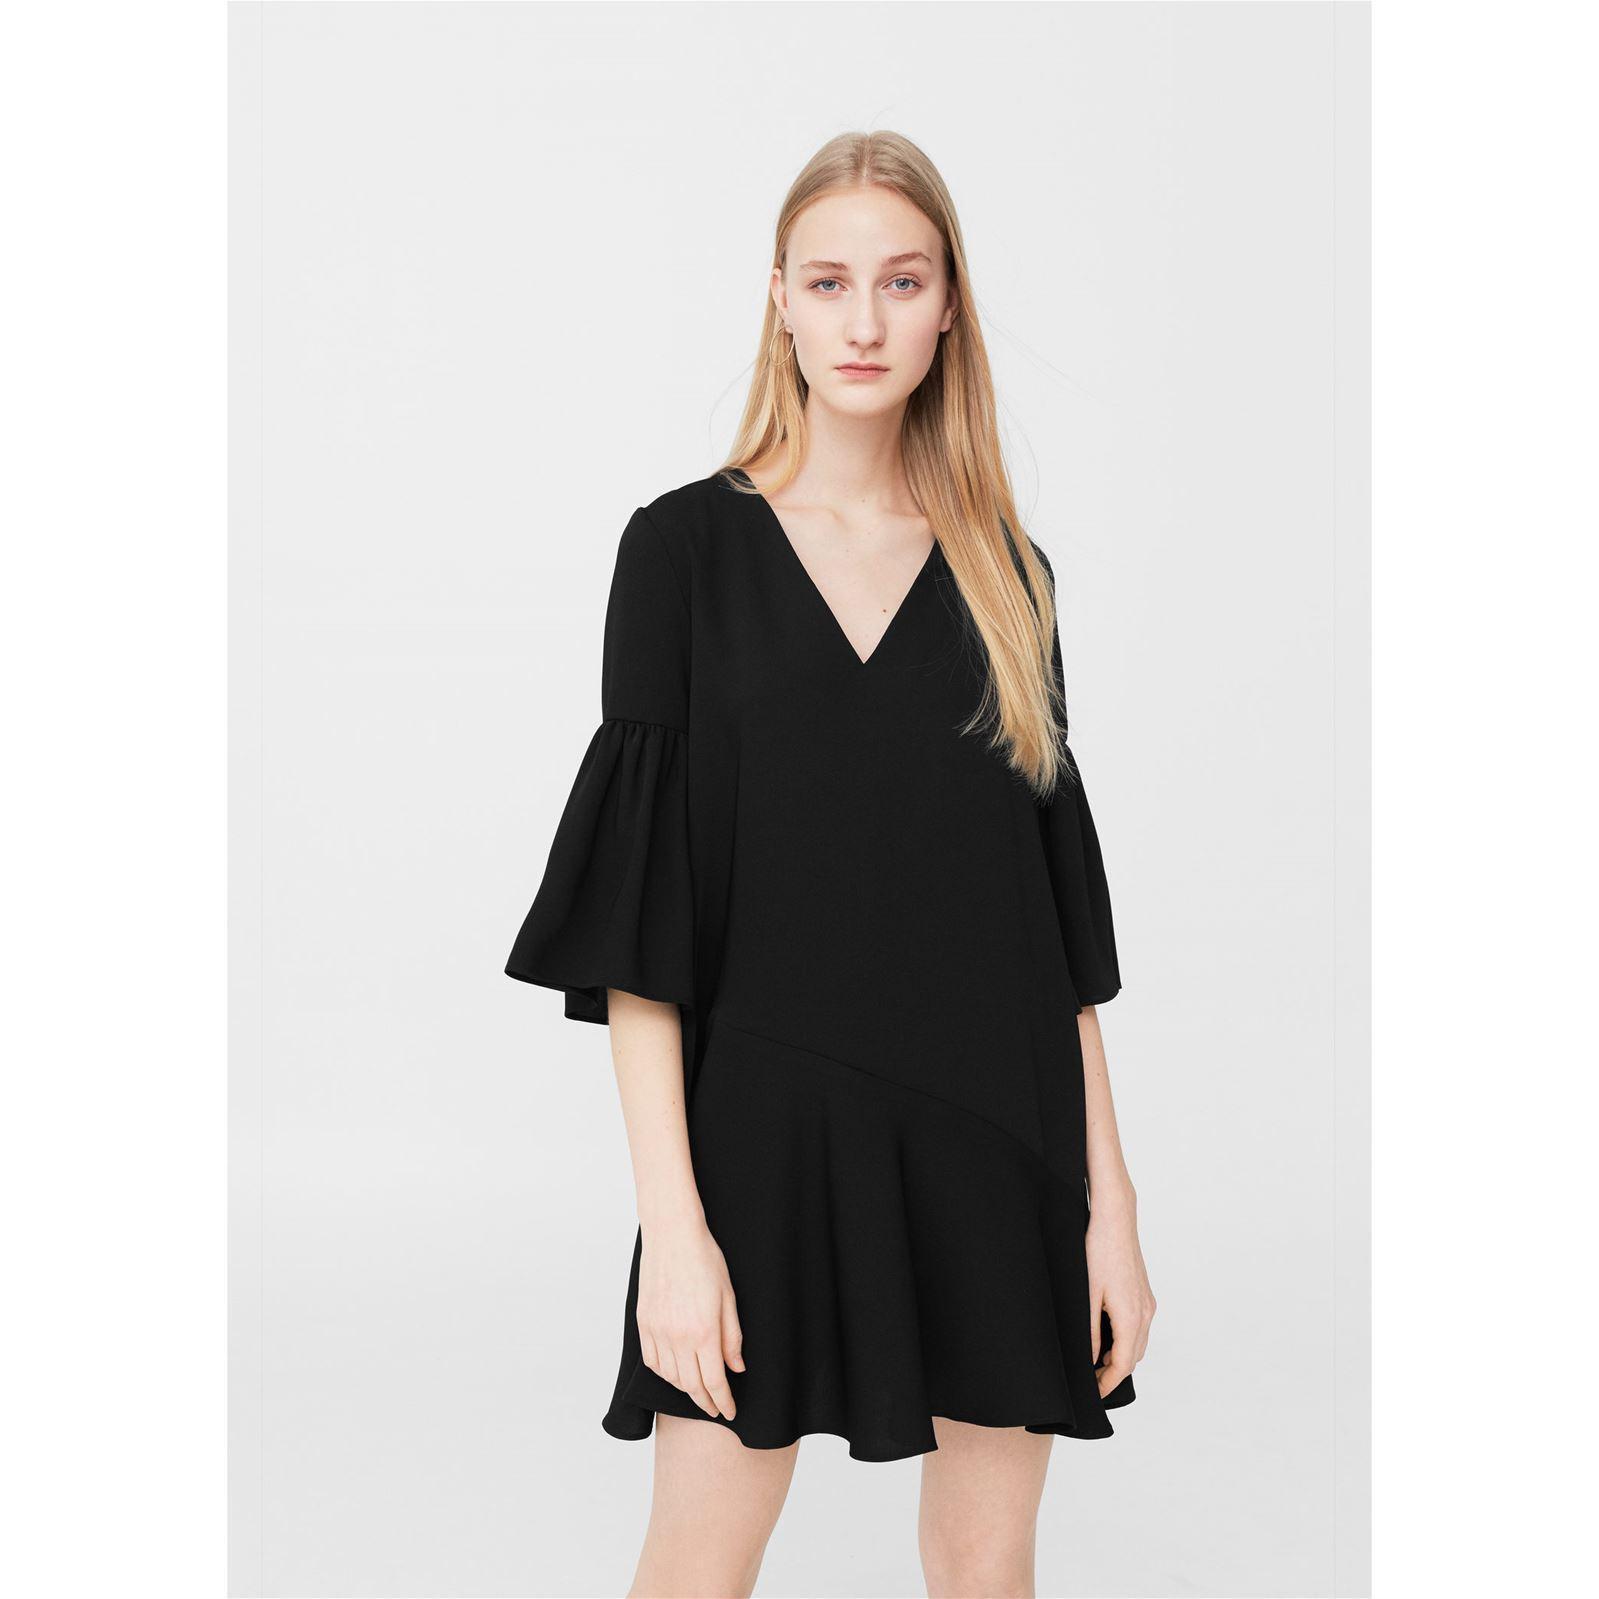 Mango robe noir